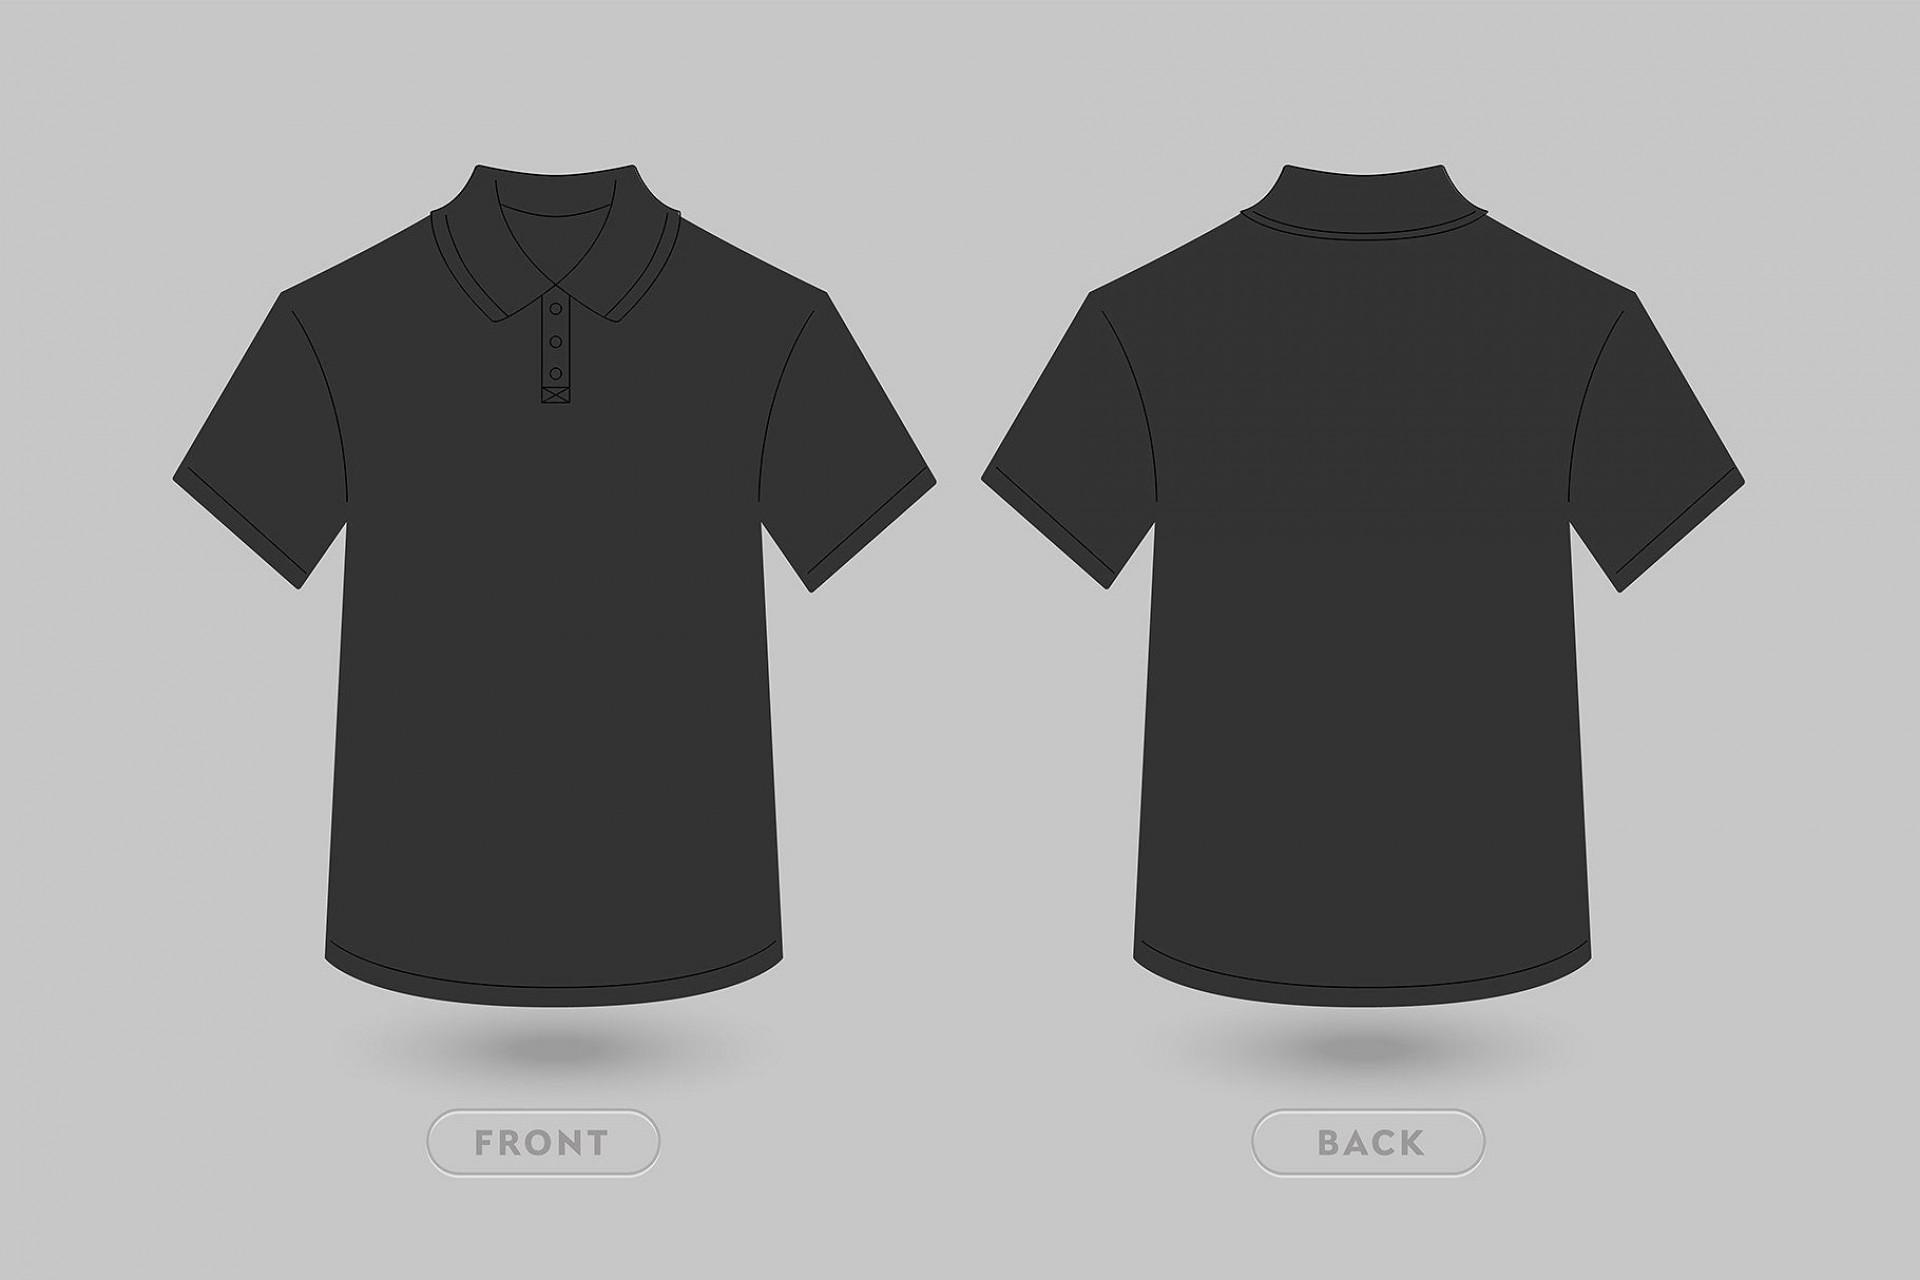 004 Unforgettable T Shirt Template Vector Design  Black Front And Back Free Download Illustrator1920